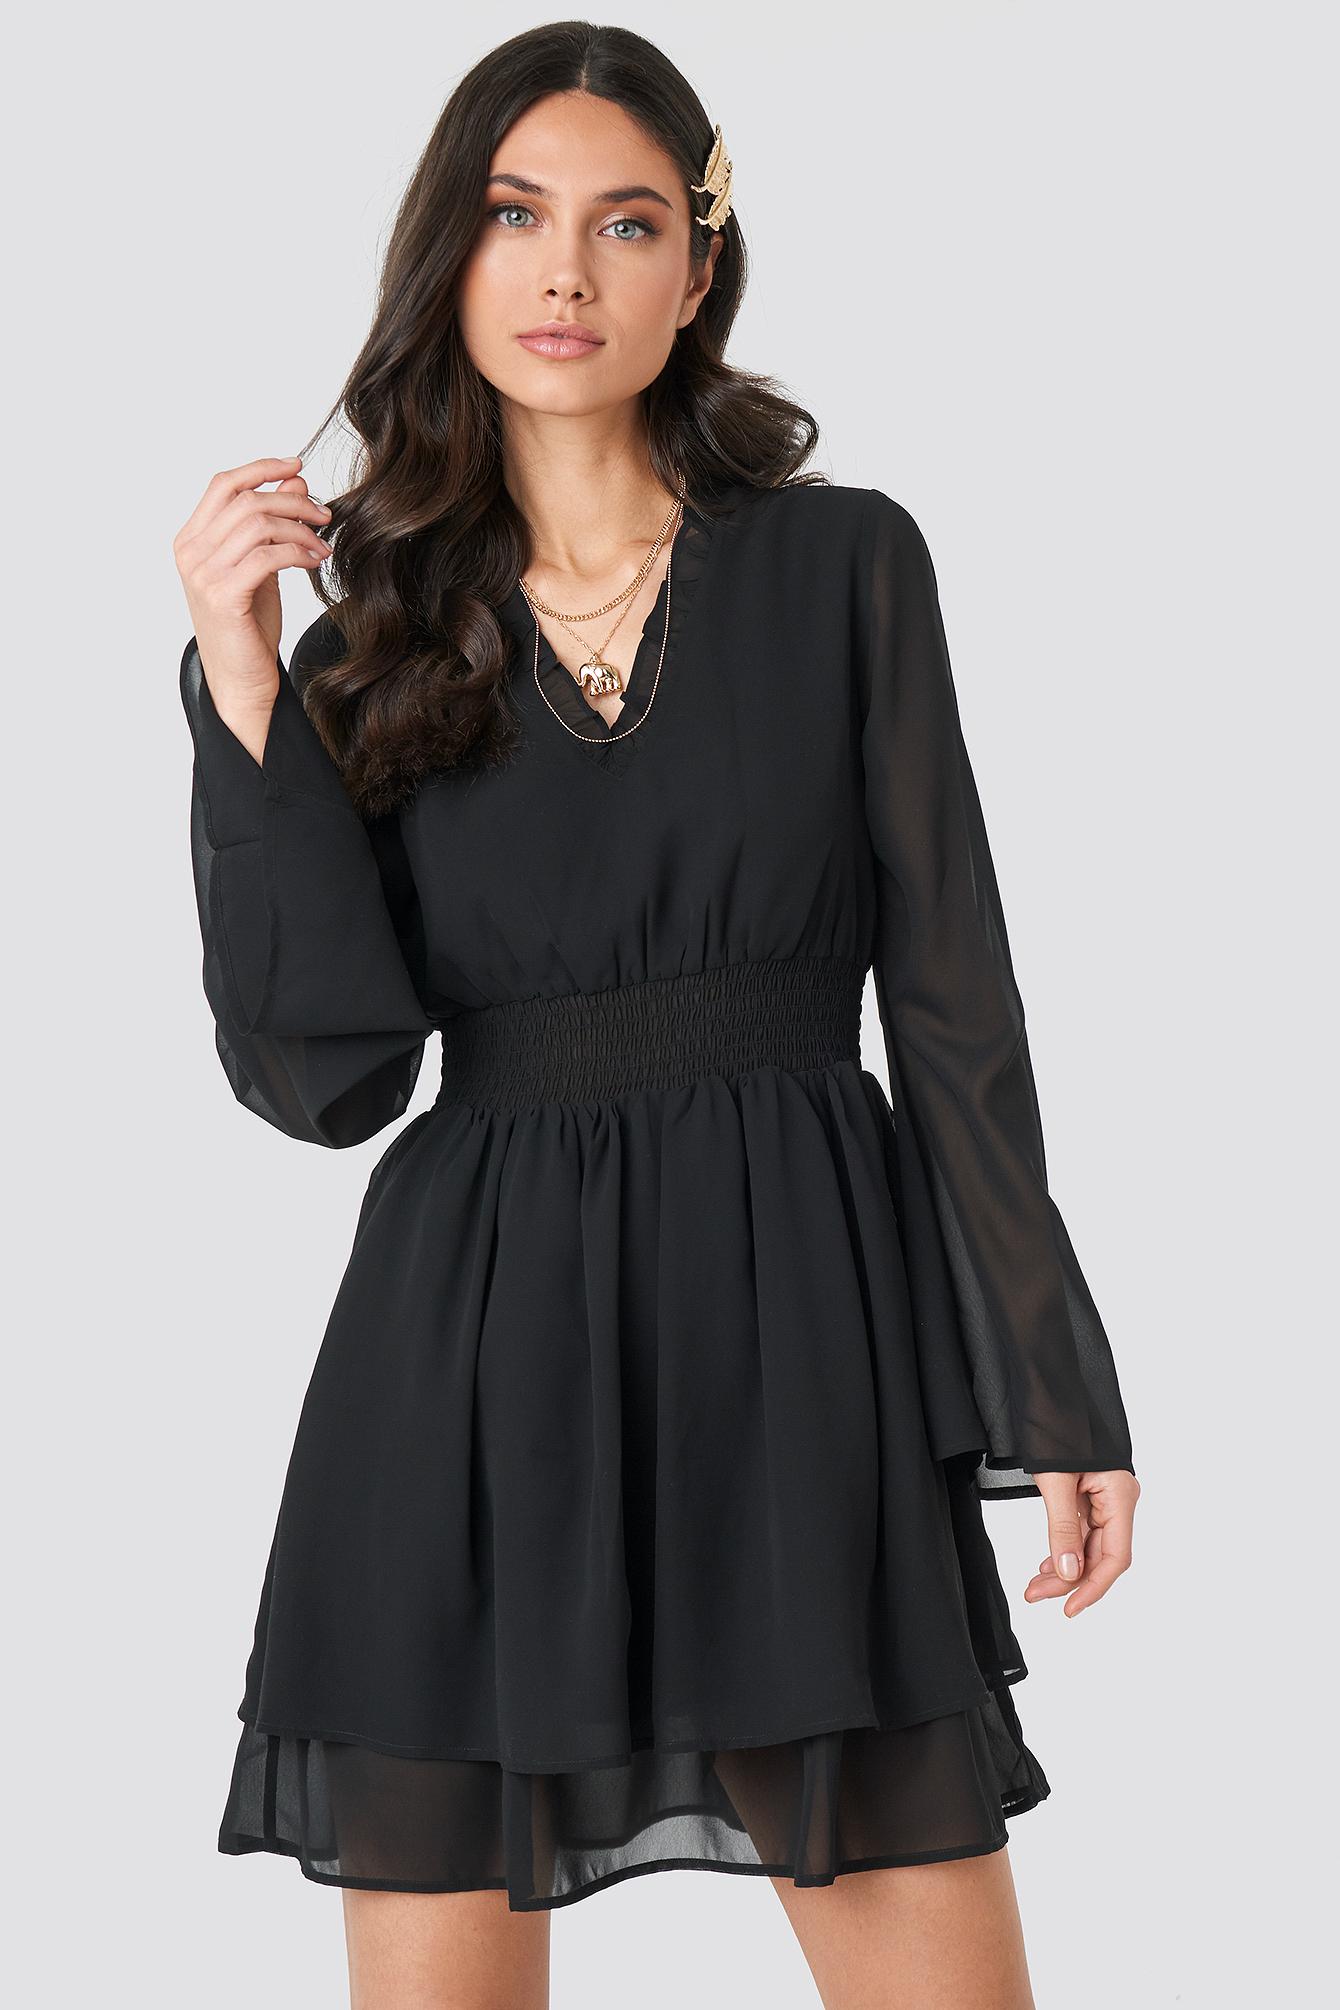 Shirred Waist Detail Dress